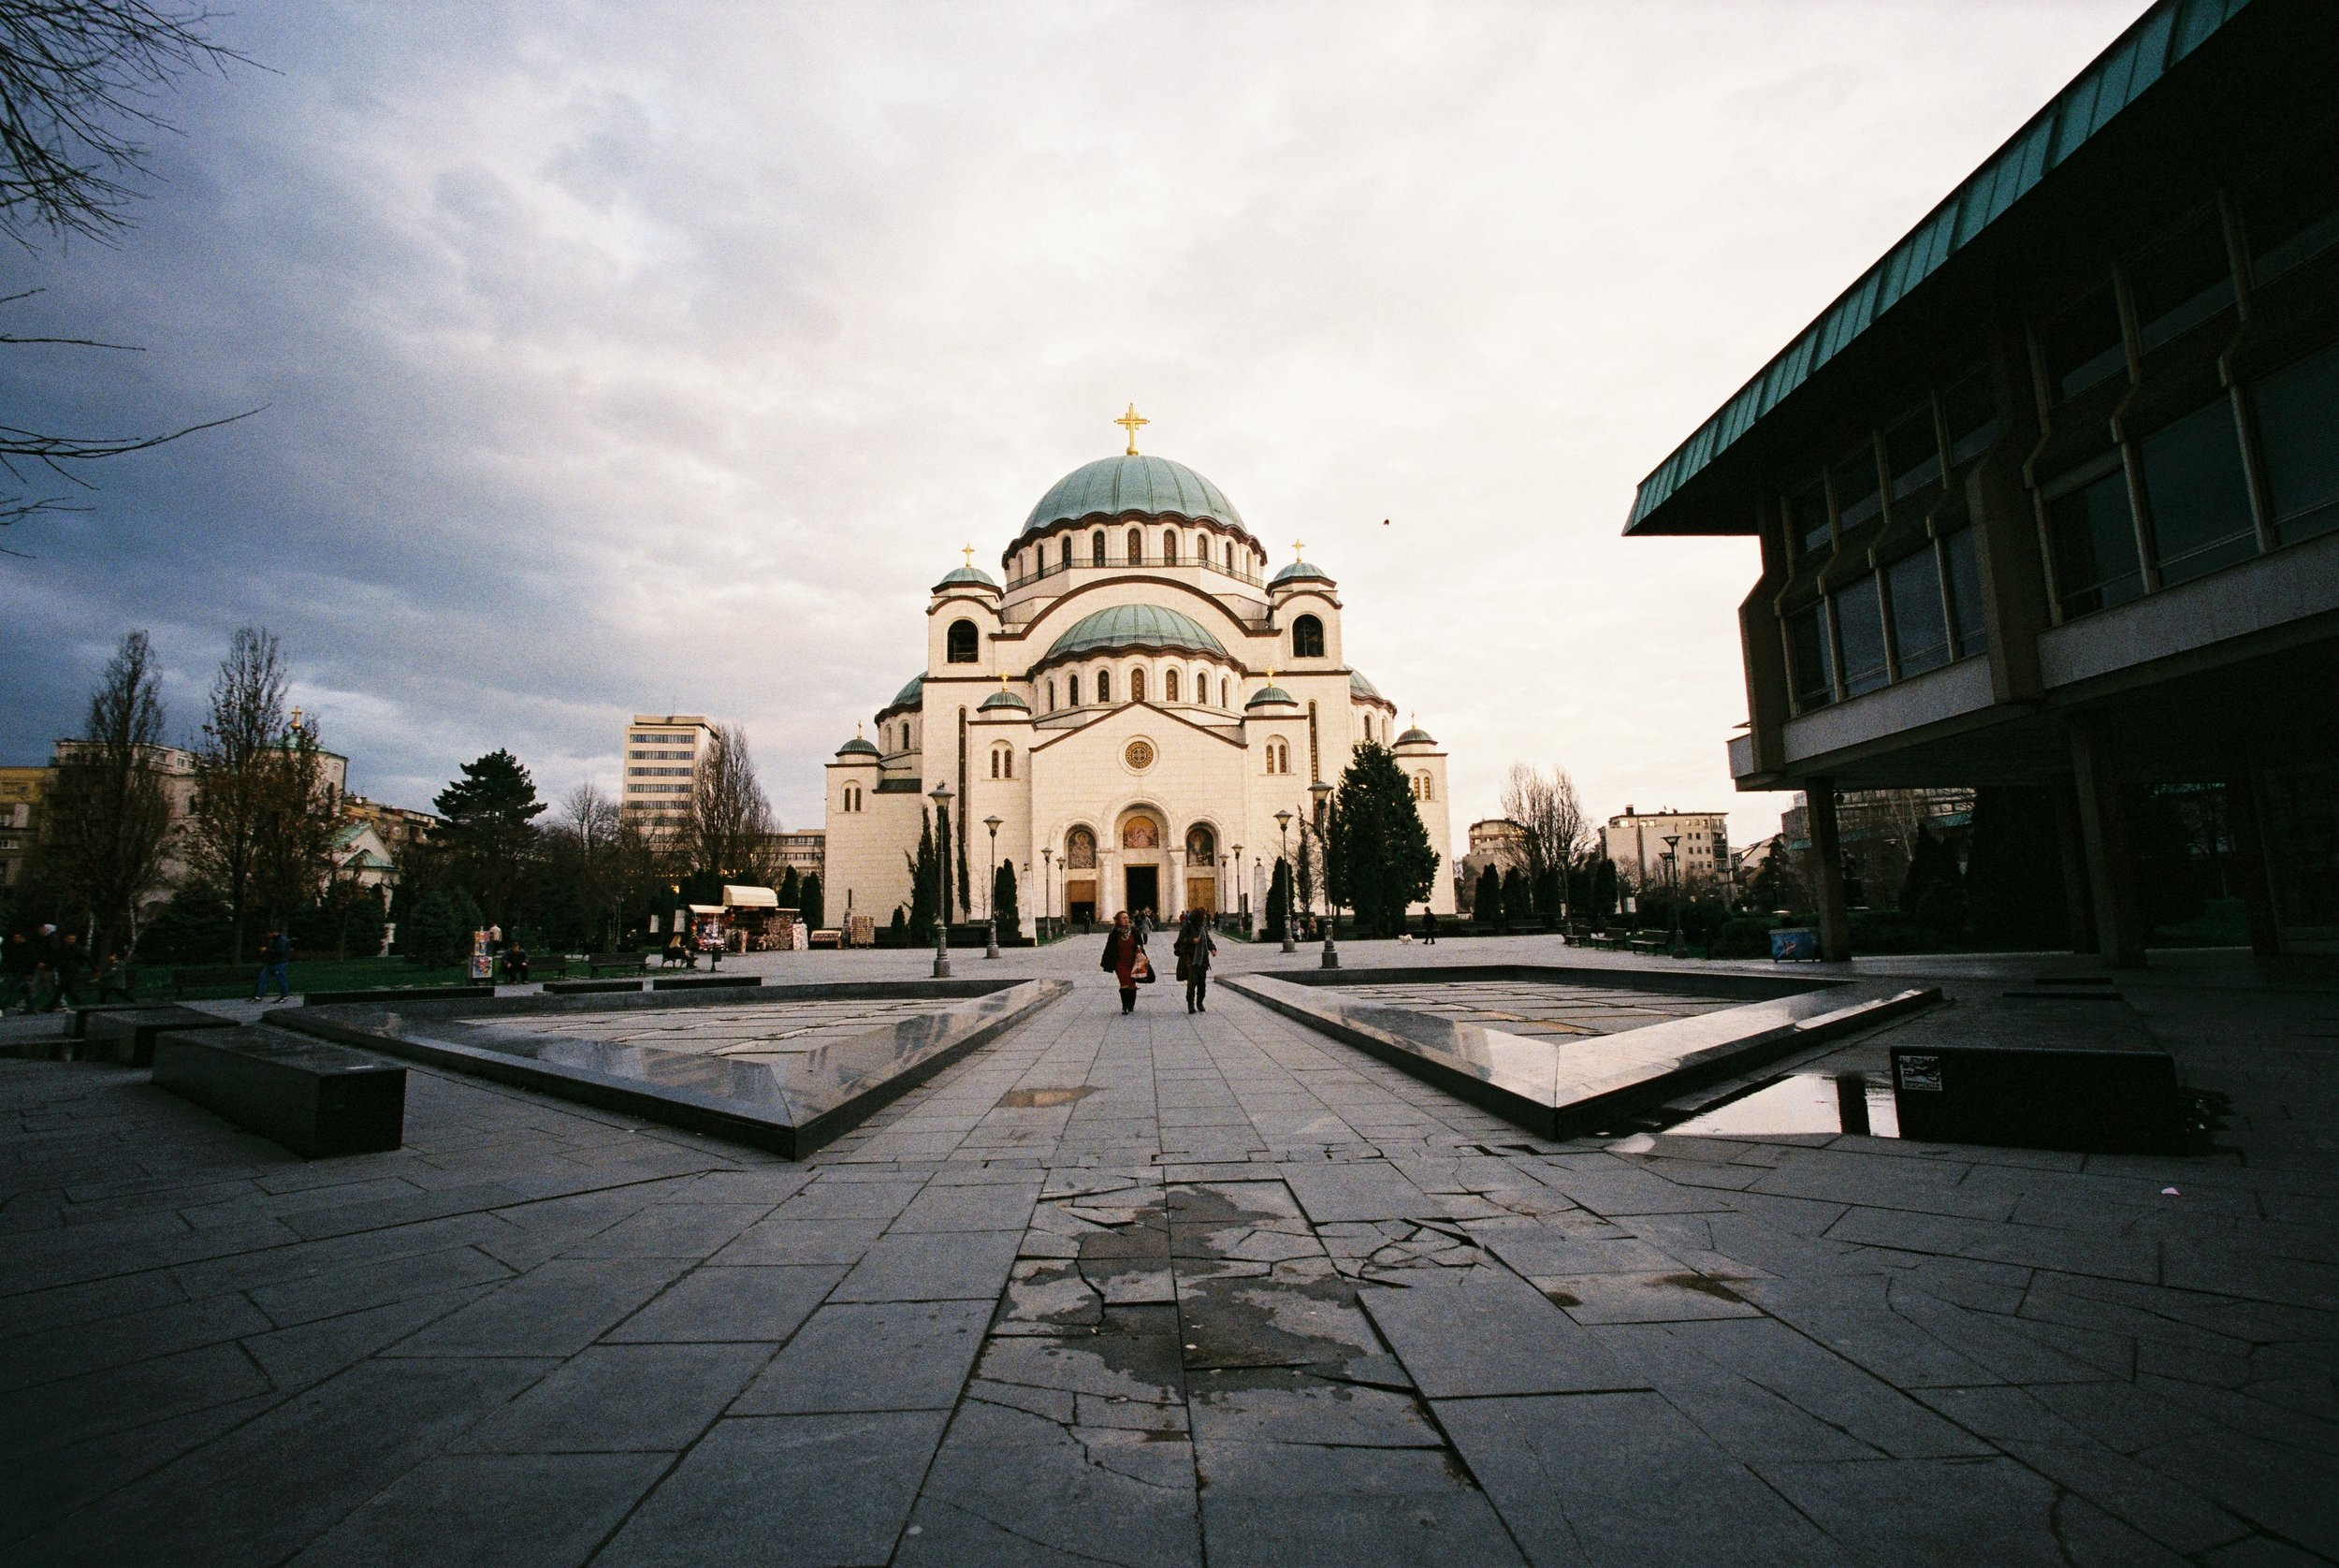 Voigtänder 15mm Super-Wide Heliar. Belgrade, Serbia - 2017